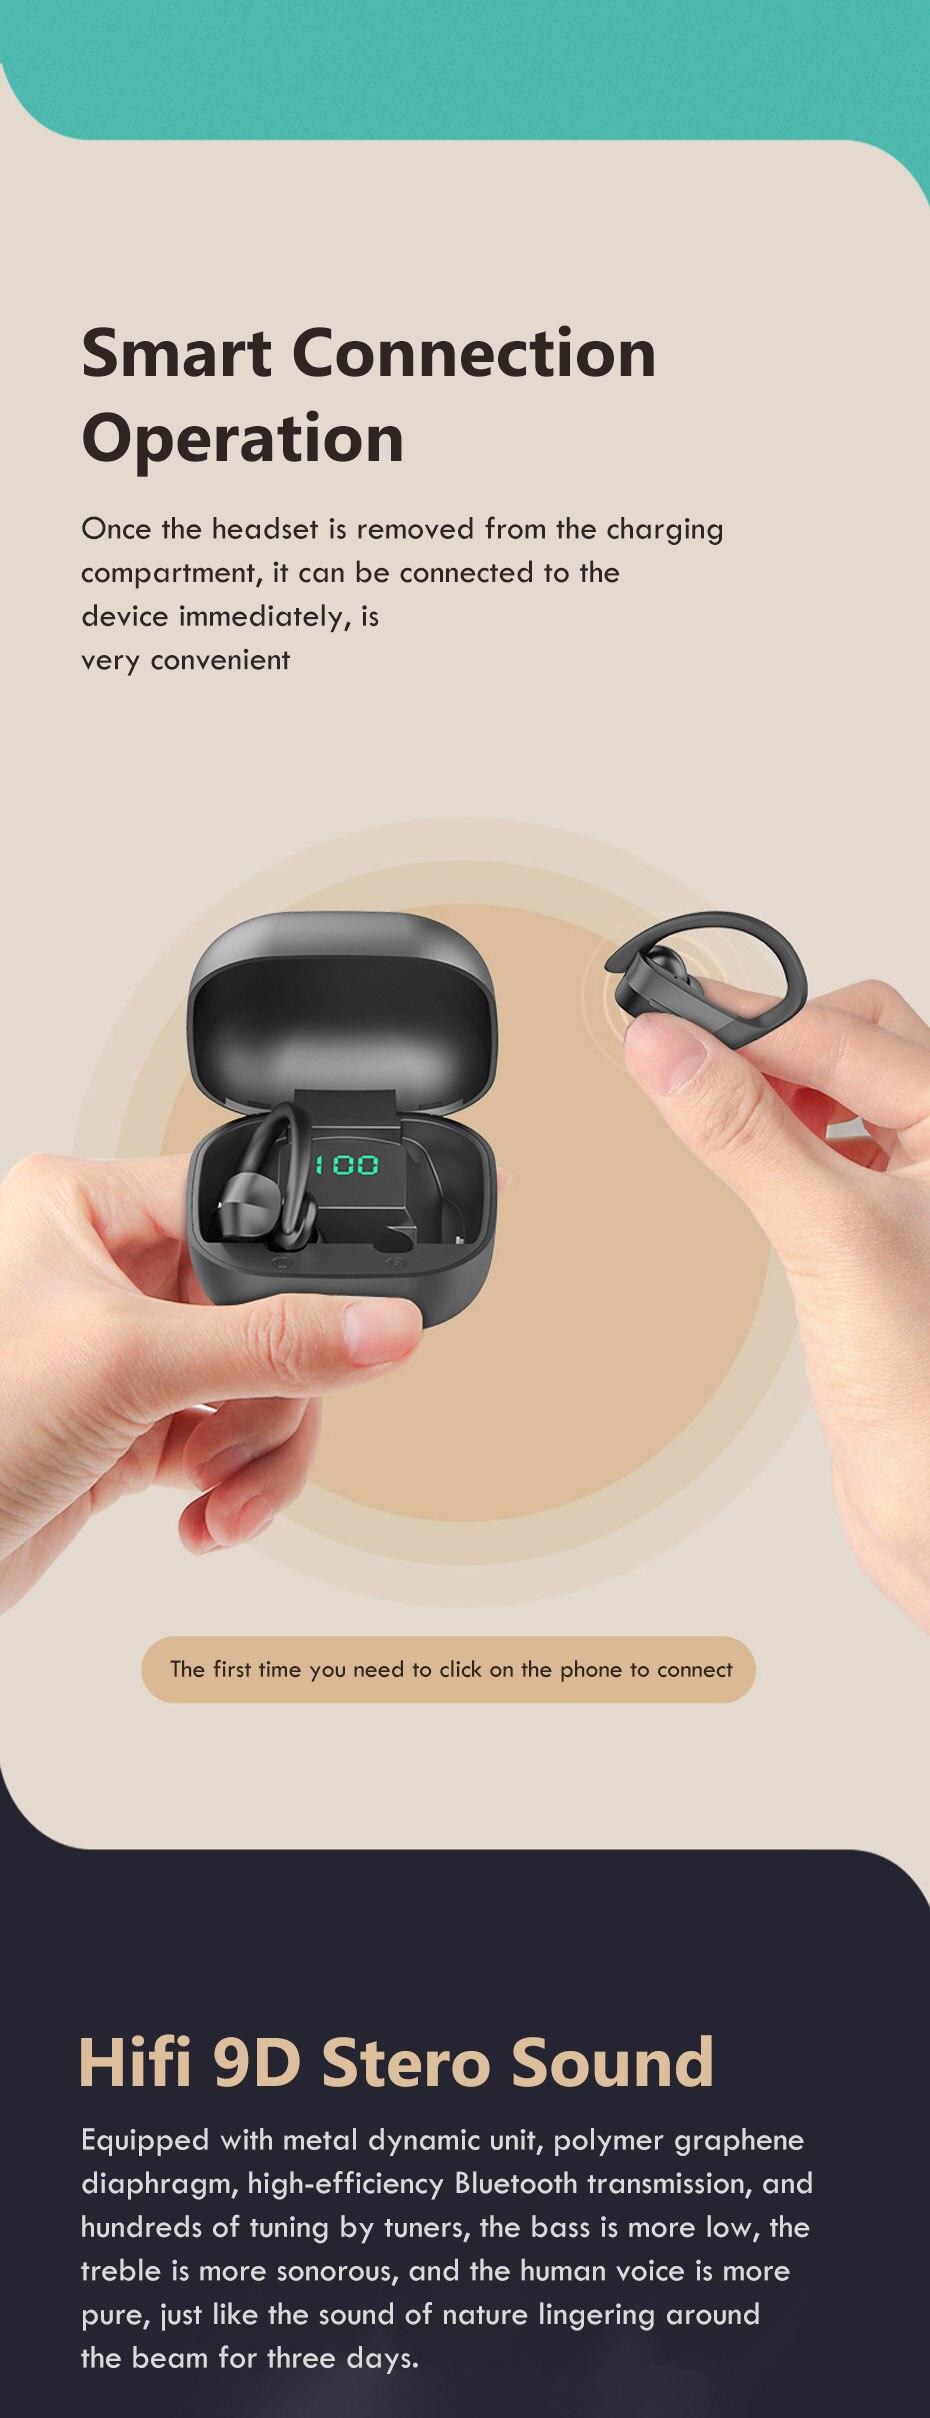 H2a534bc9fa37471ebf293a9a7281f328x Waterproof Headphone Touch Control HiFi Tws Earbuds